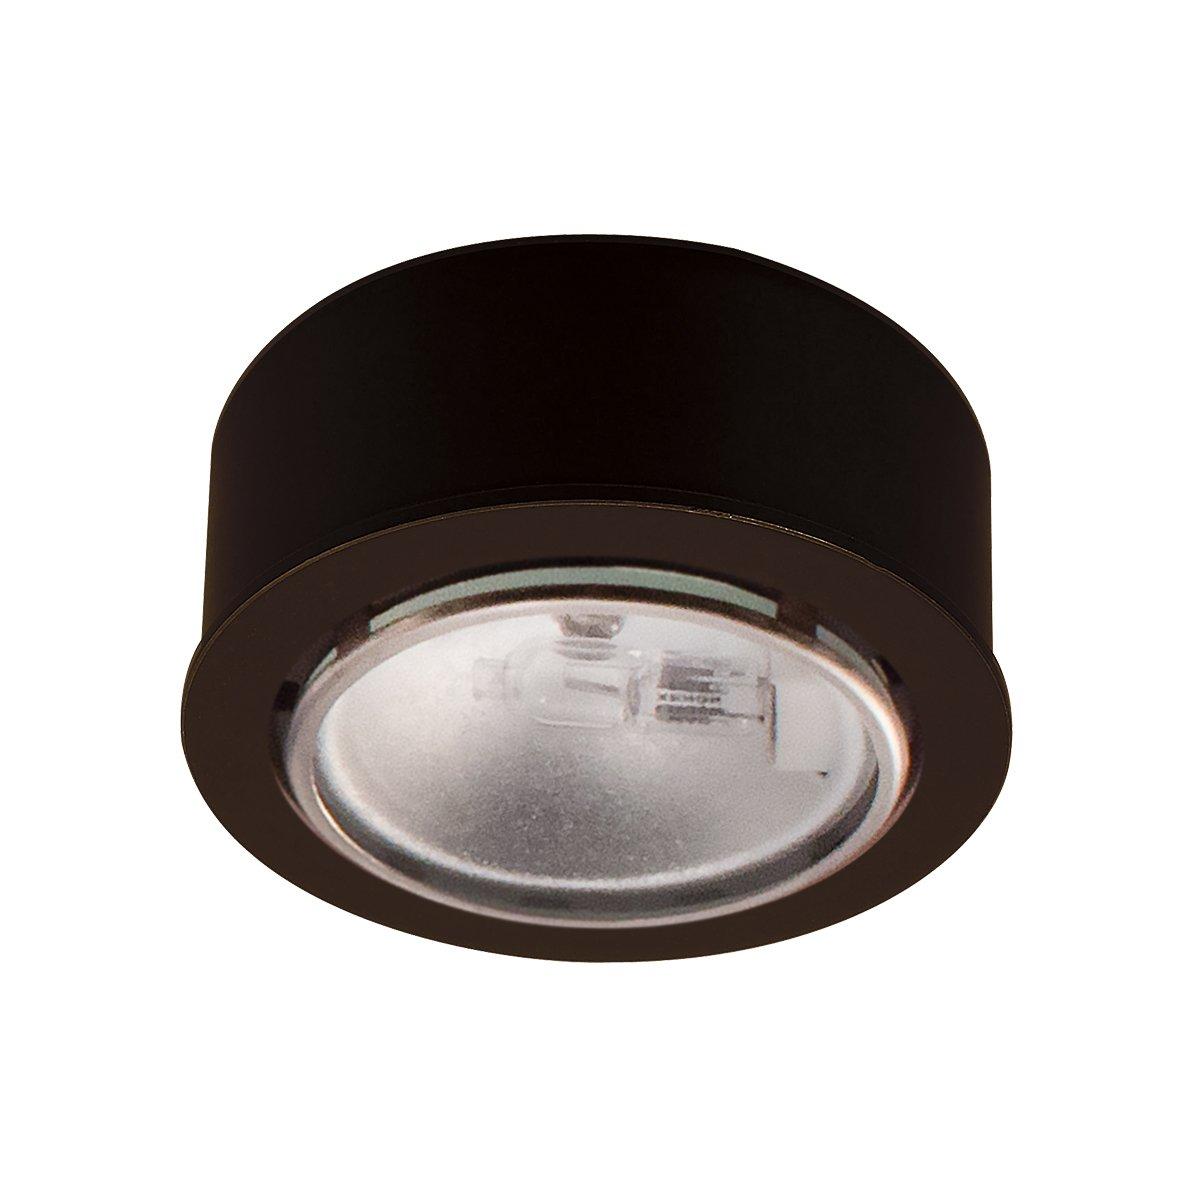 WAC Lighting 低電圧 円形 キセノン ボタン型 照明 HR-88-BK 1 B002951M8I ブラック|ハロゲン ブラック